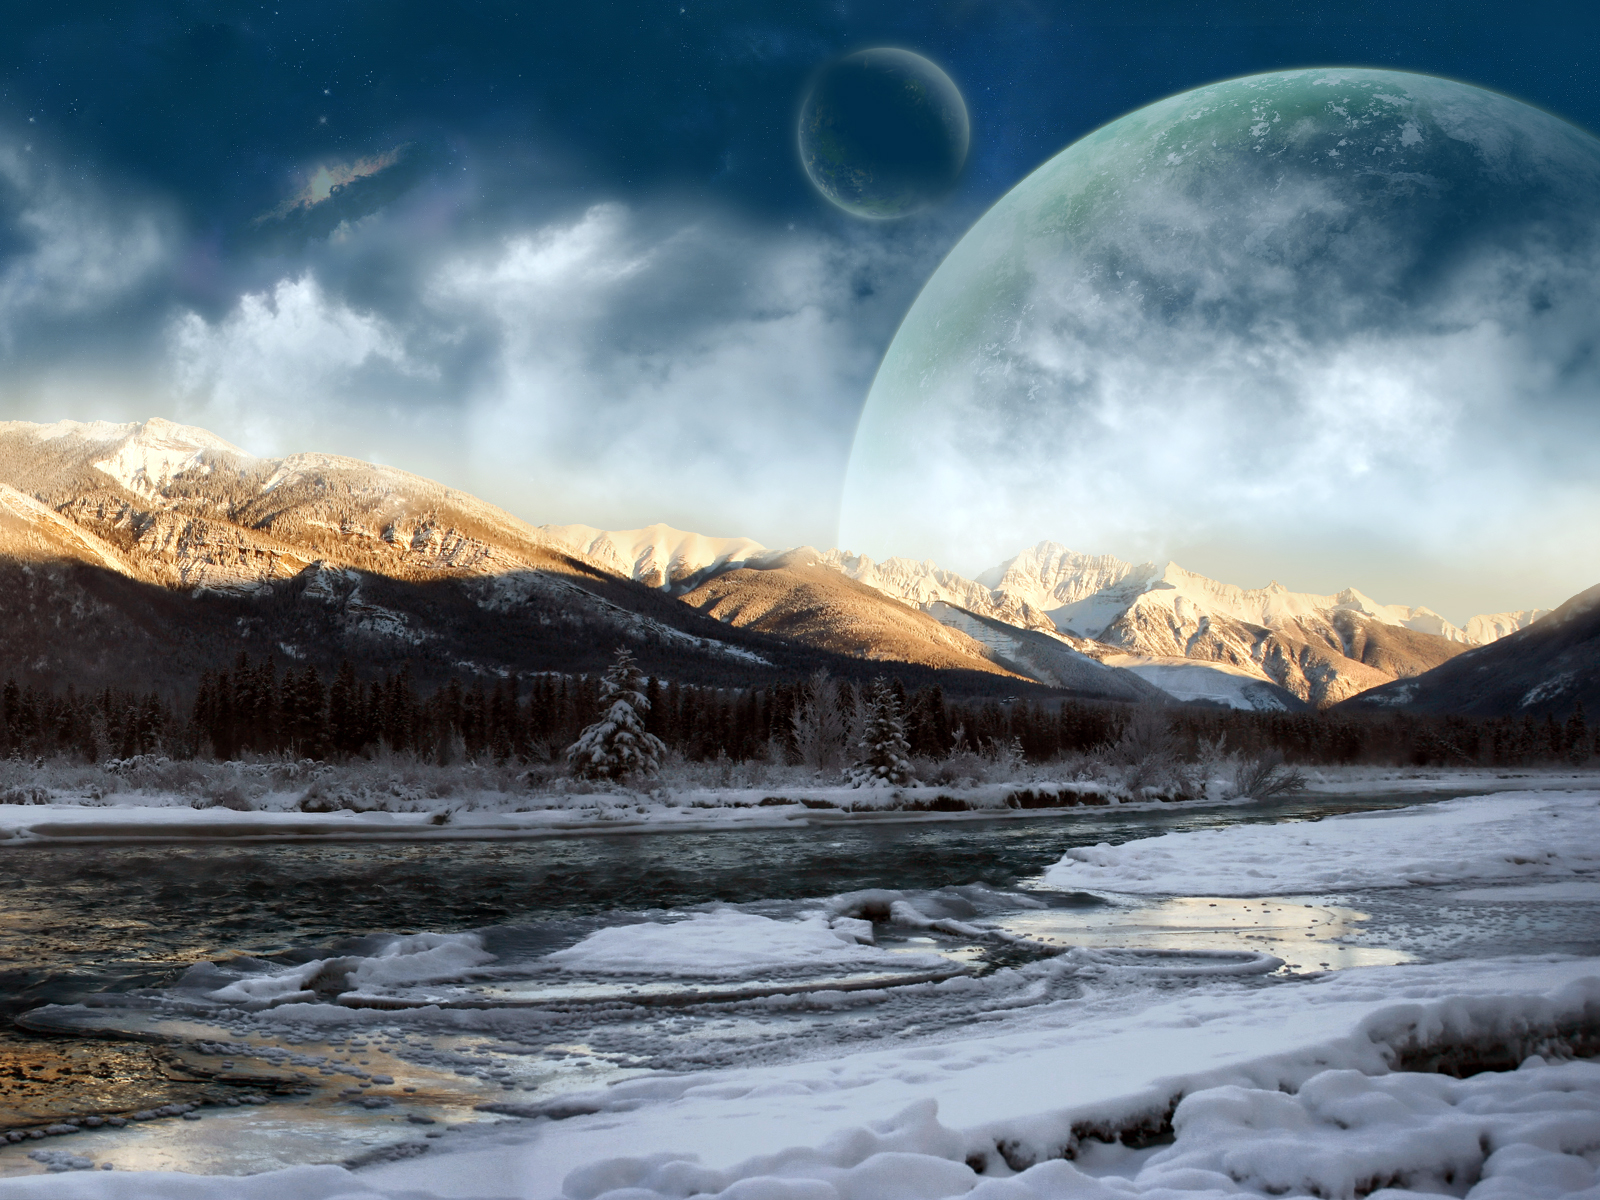 Moon Mountains Laptop Wallpaper Wallpaper Desktop HD 1600x1200